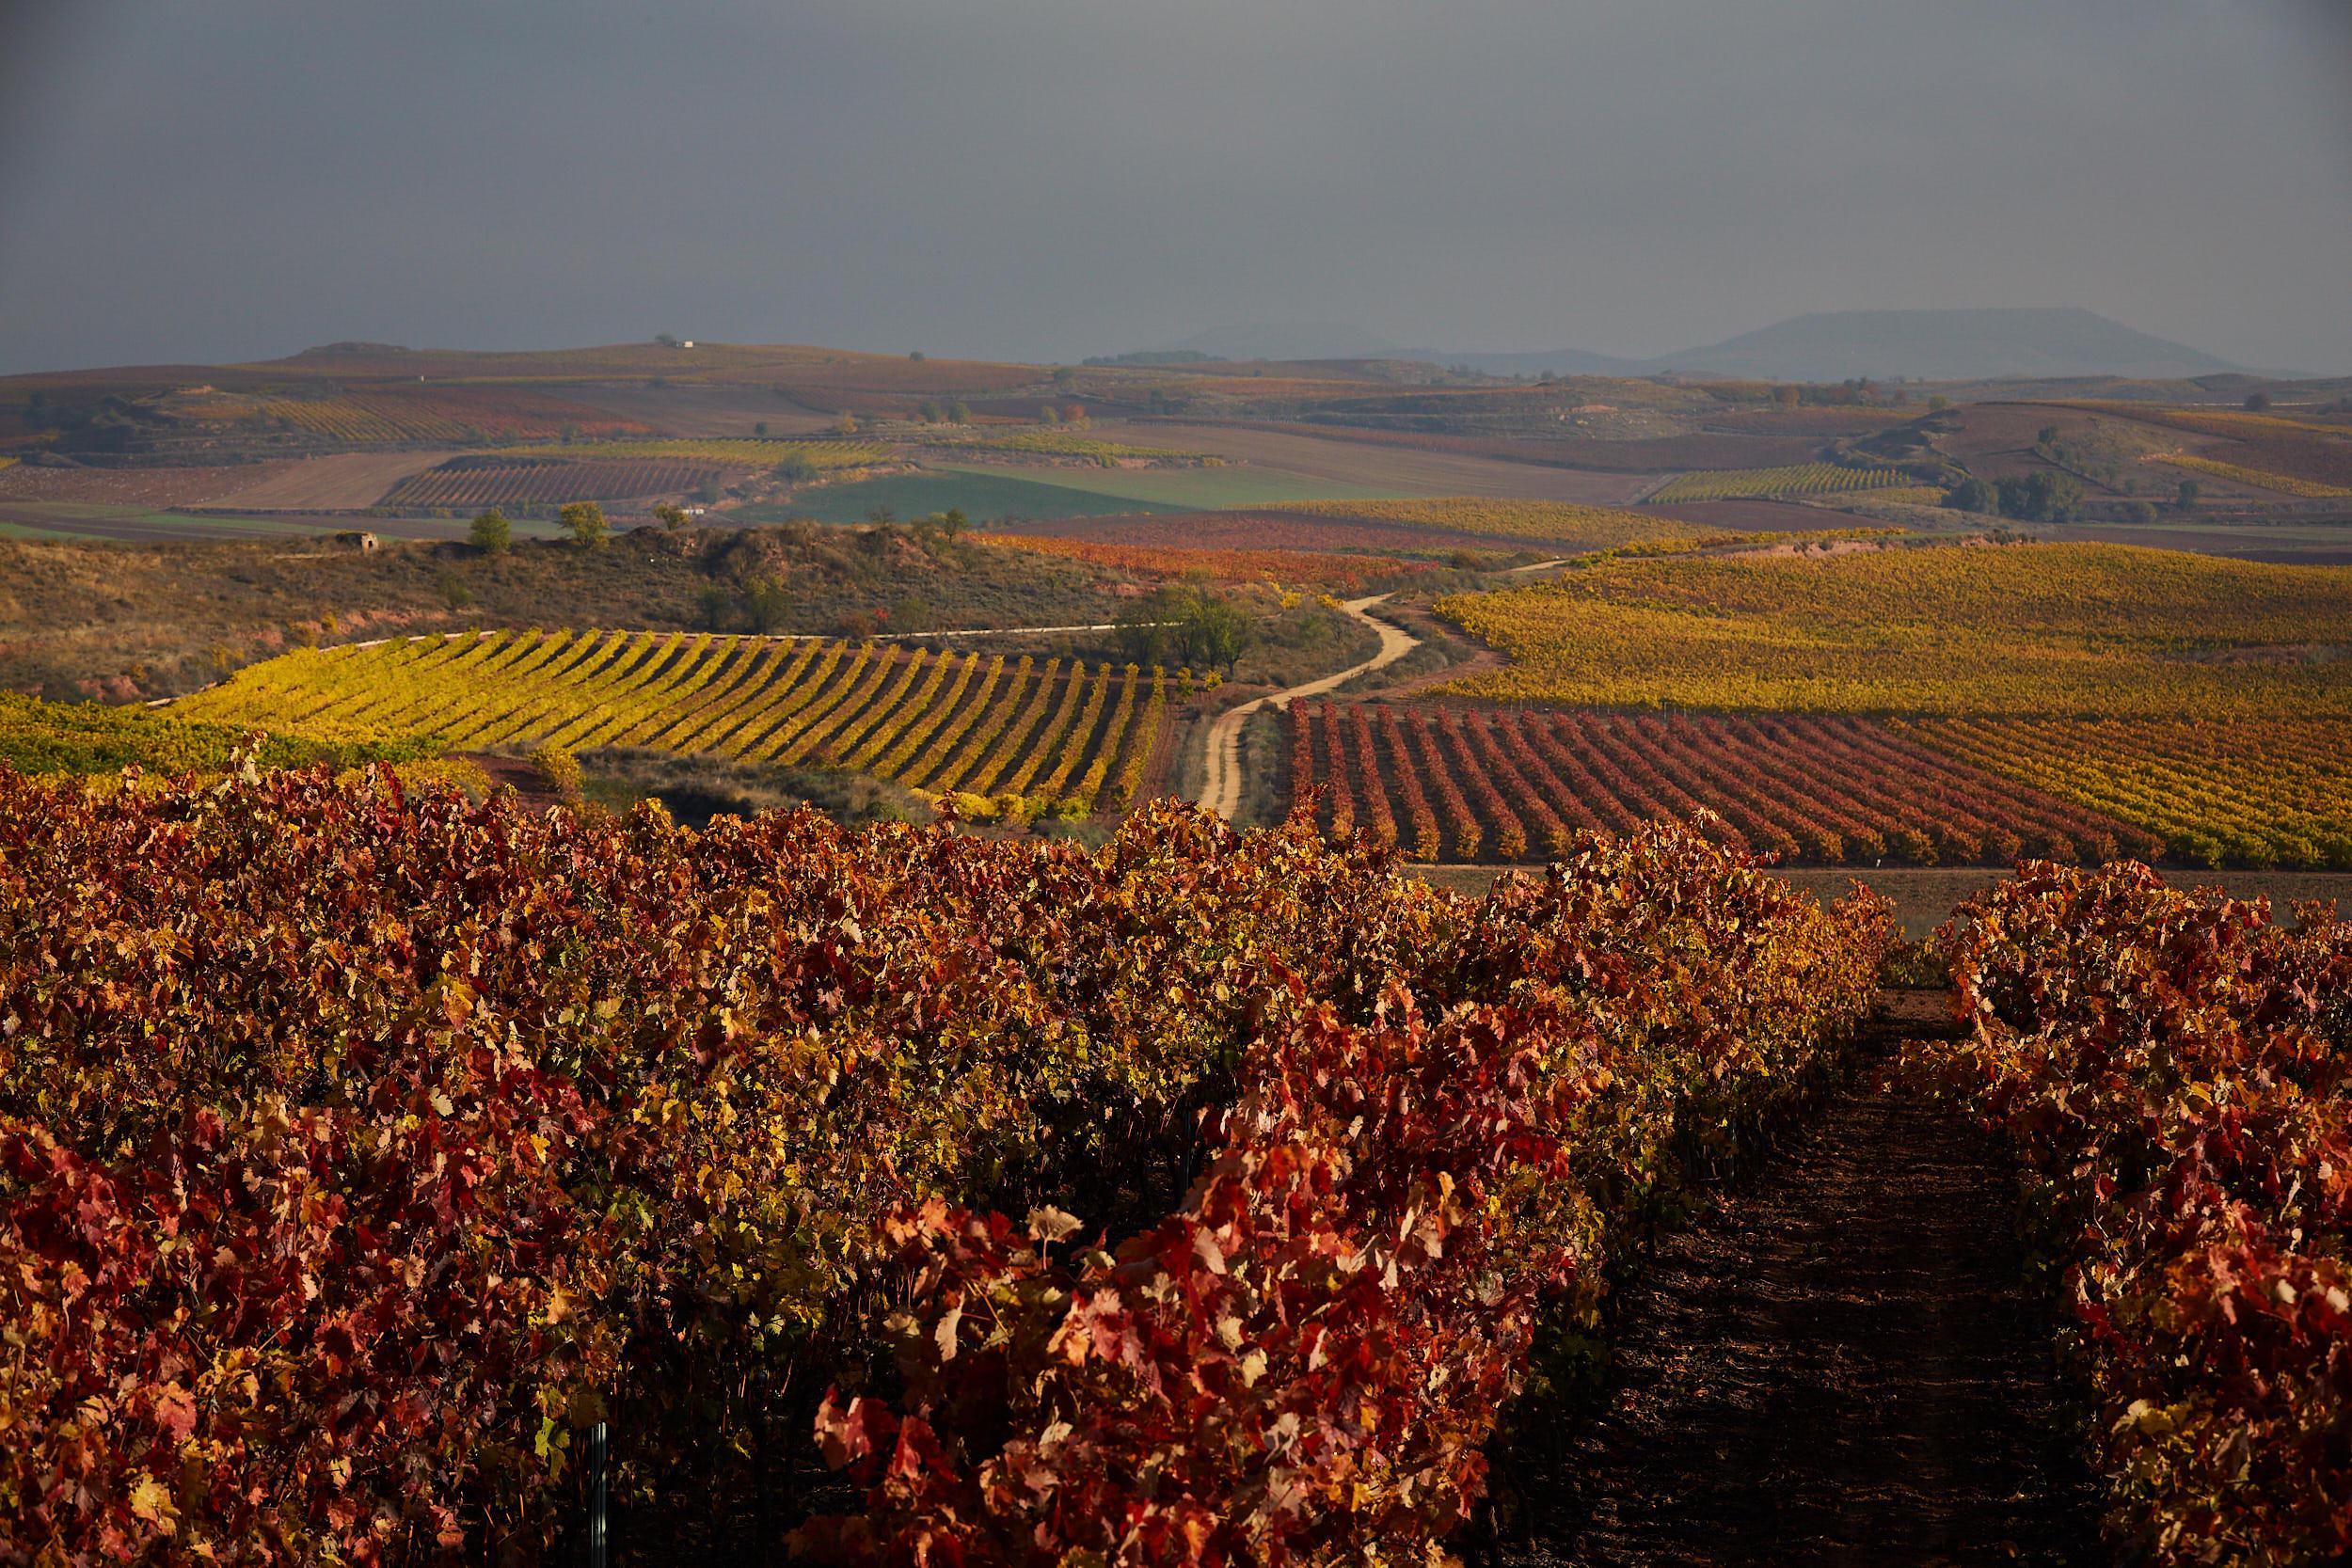 1811Commercial-professional-wine-photography-la-rioja-spain-James-Sturcke_0045.jpg